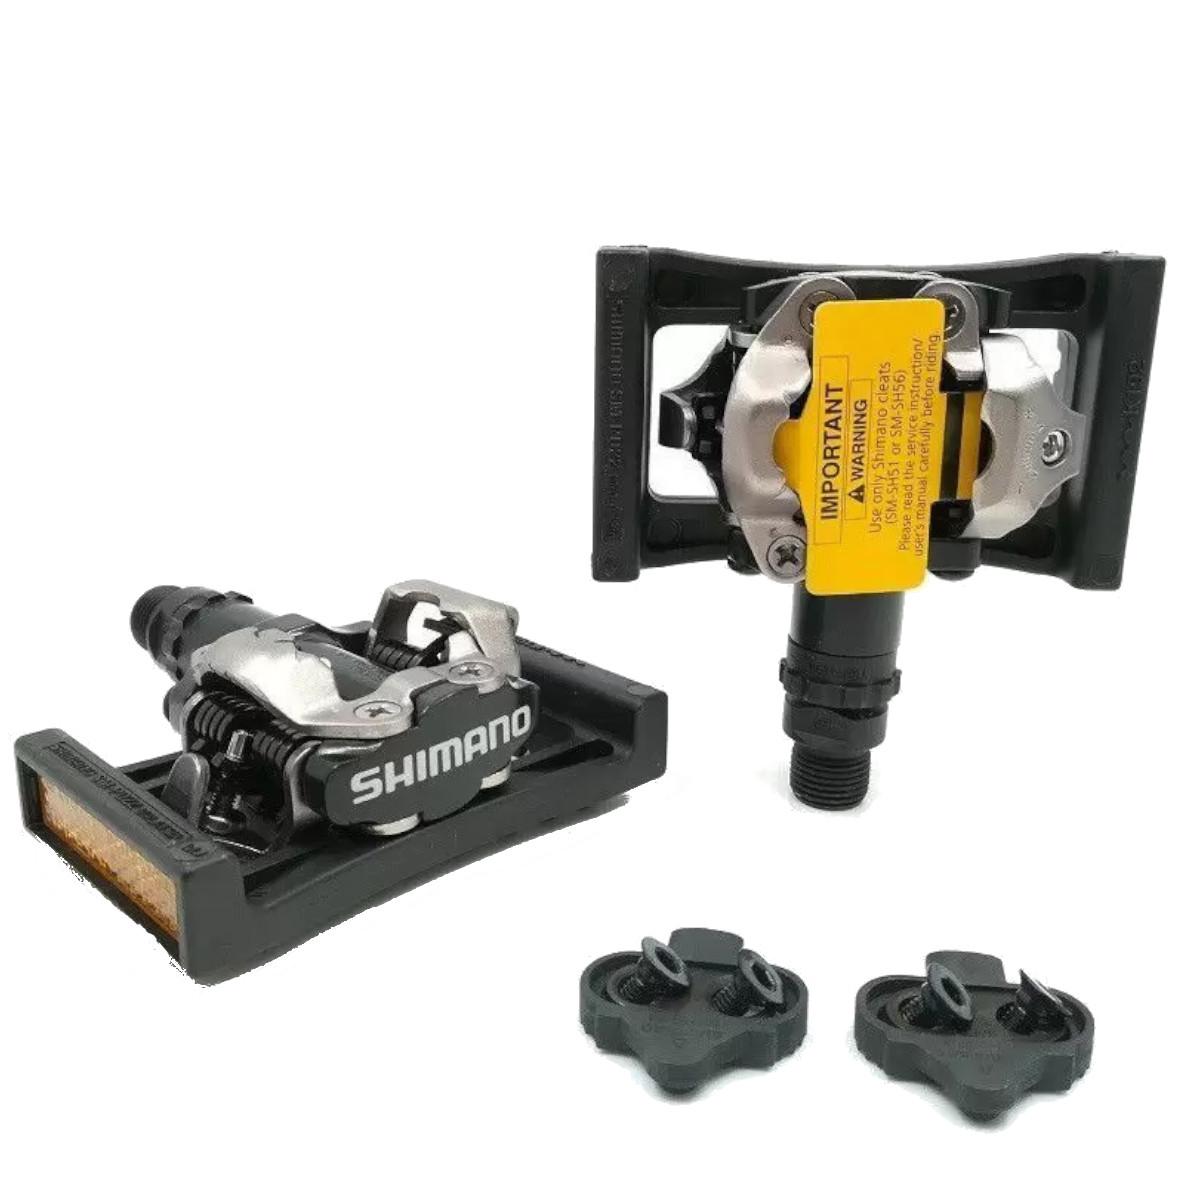 Kit Pedal Shimano M520 MTB Com Tacos + Plataforma Shimano